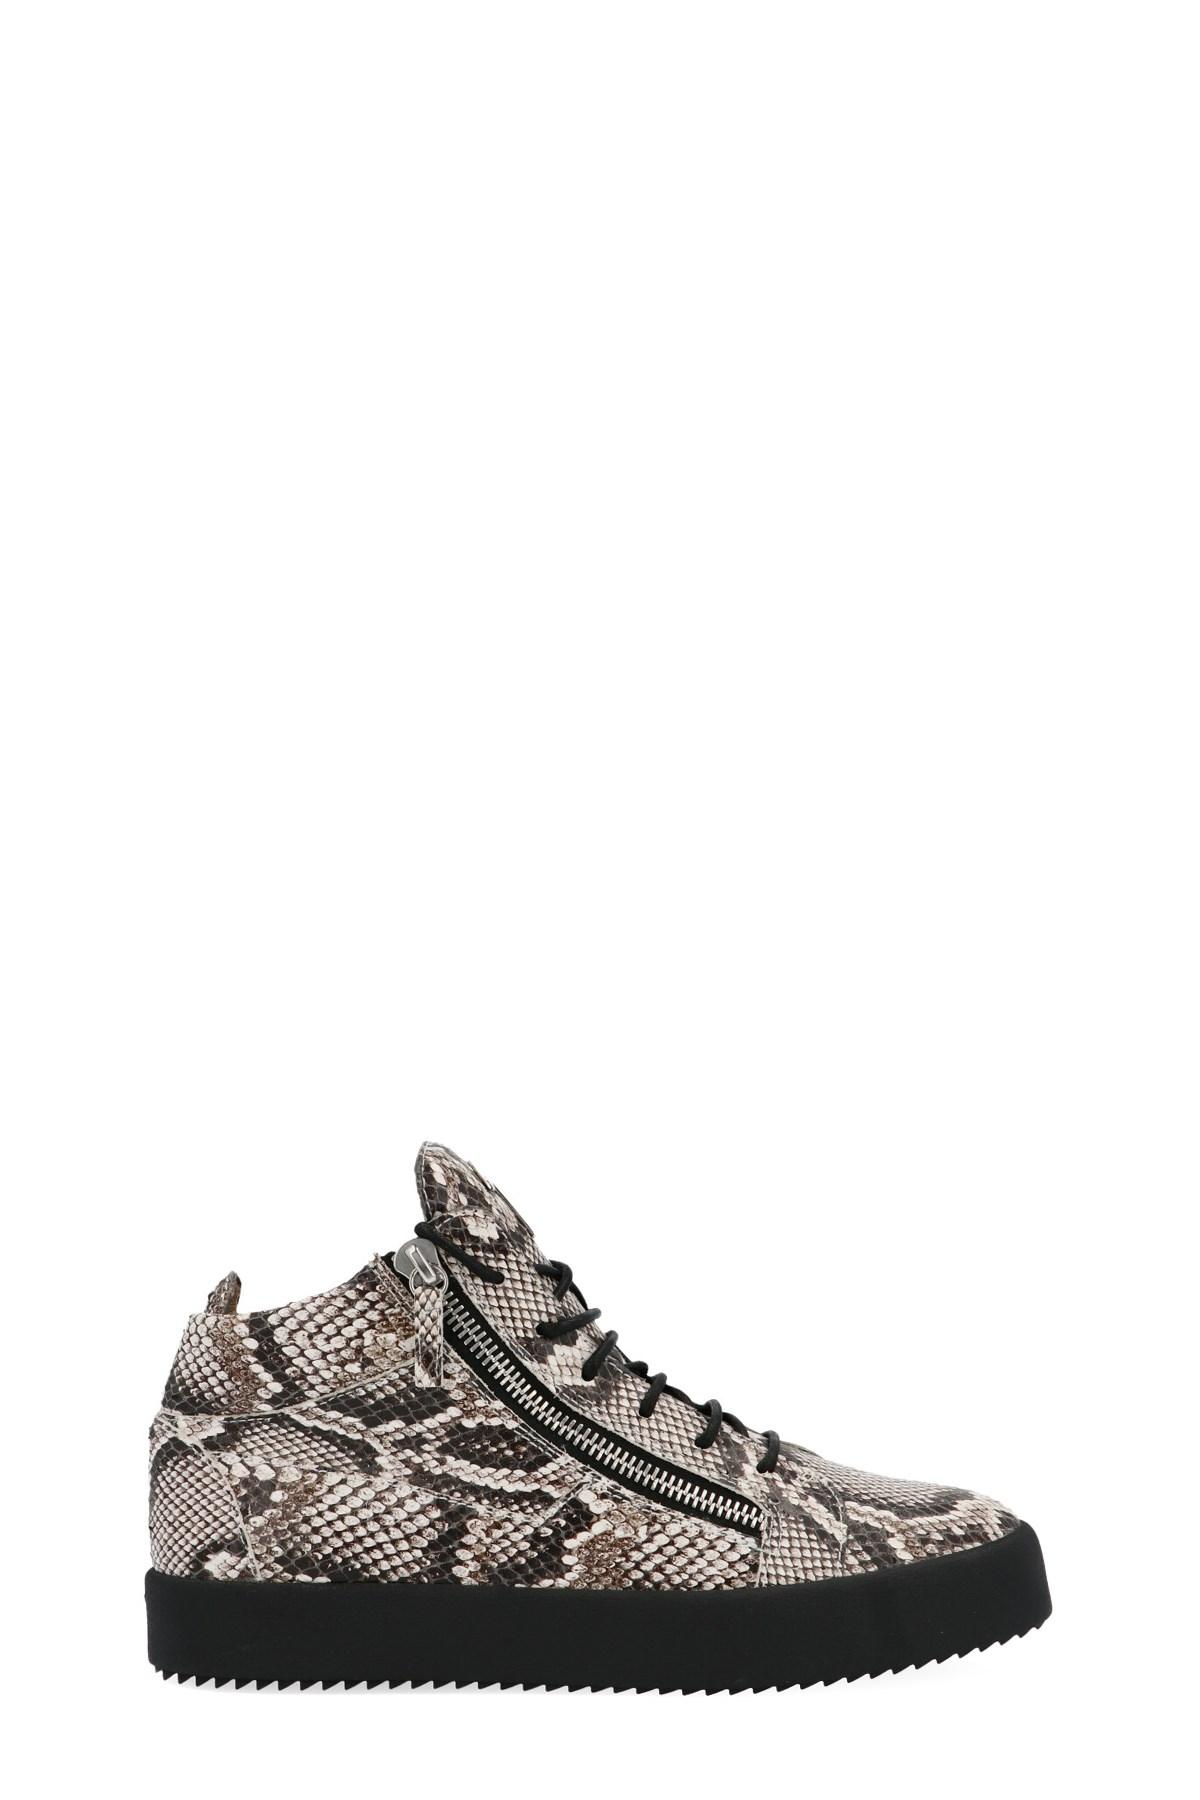 giuseppe zanotti 'May london' sneakers